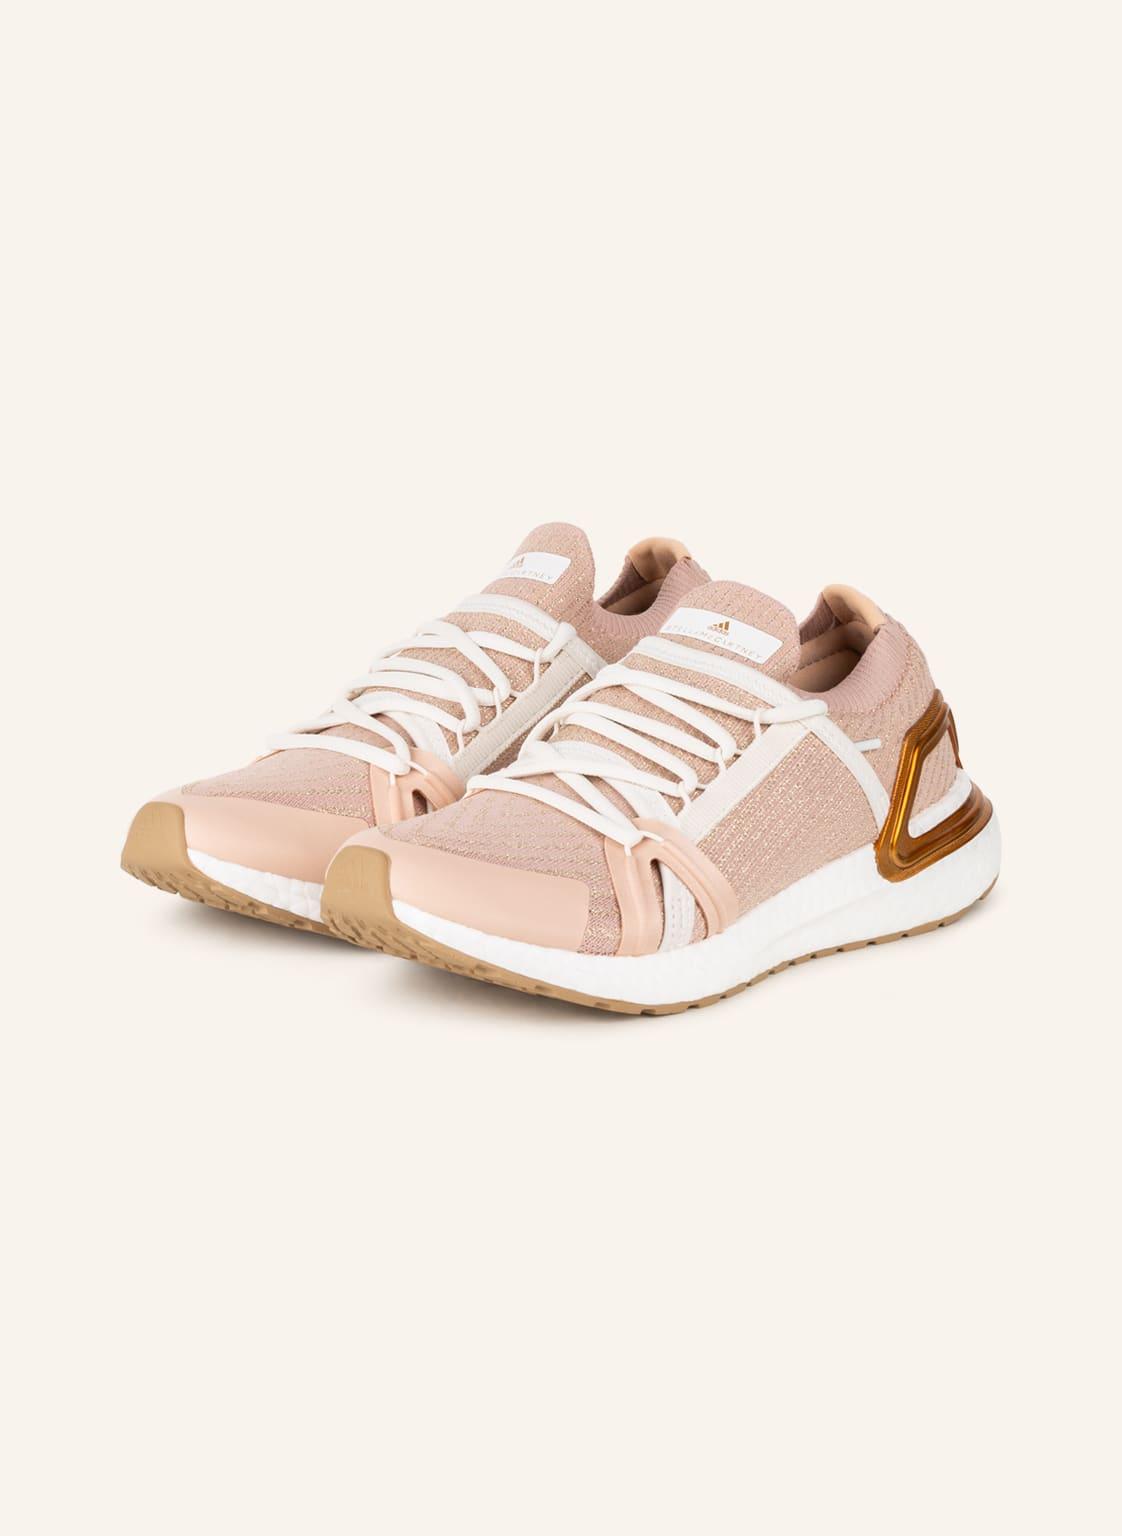 Image of Adidas By Stella Mccartney Laufschuhe Asmc Ultraboost 20 rosa